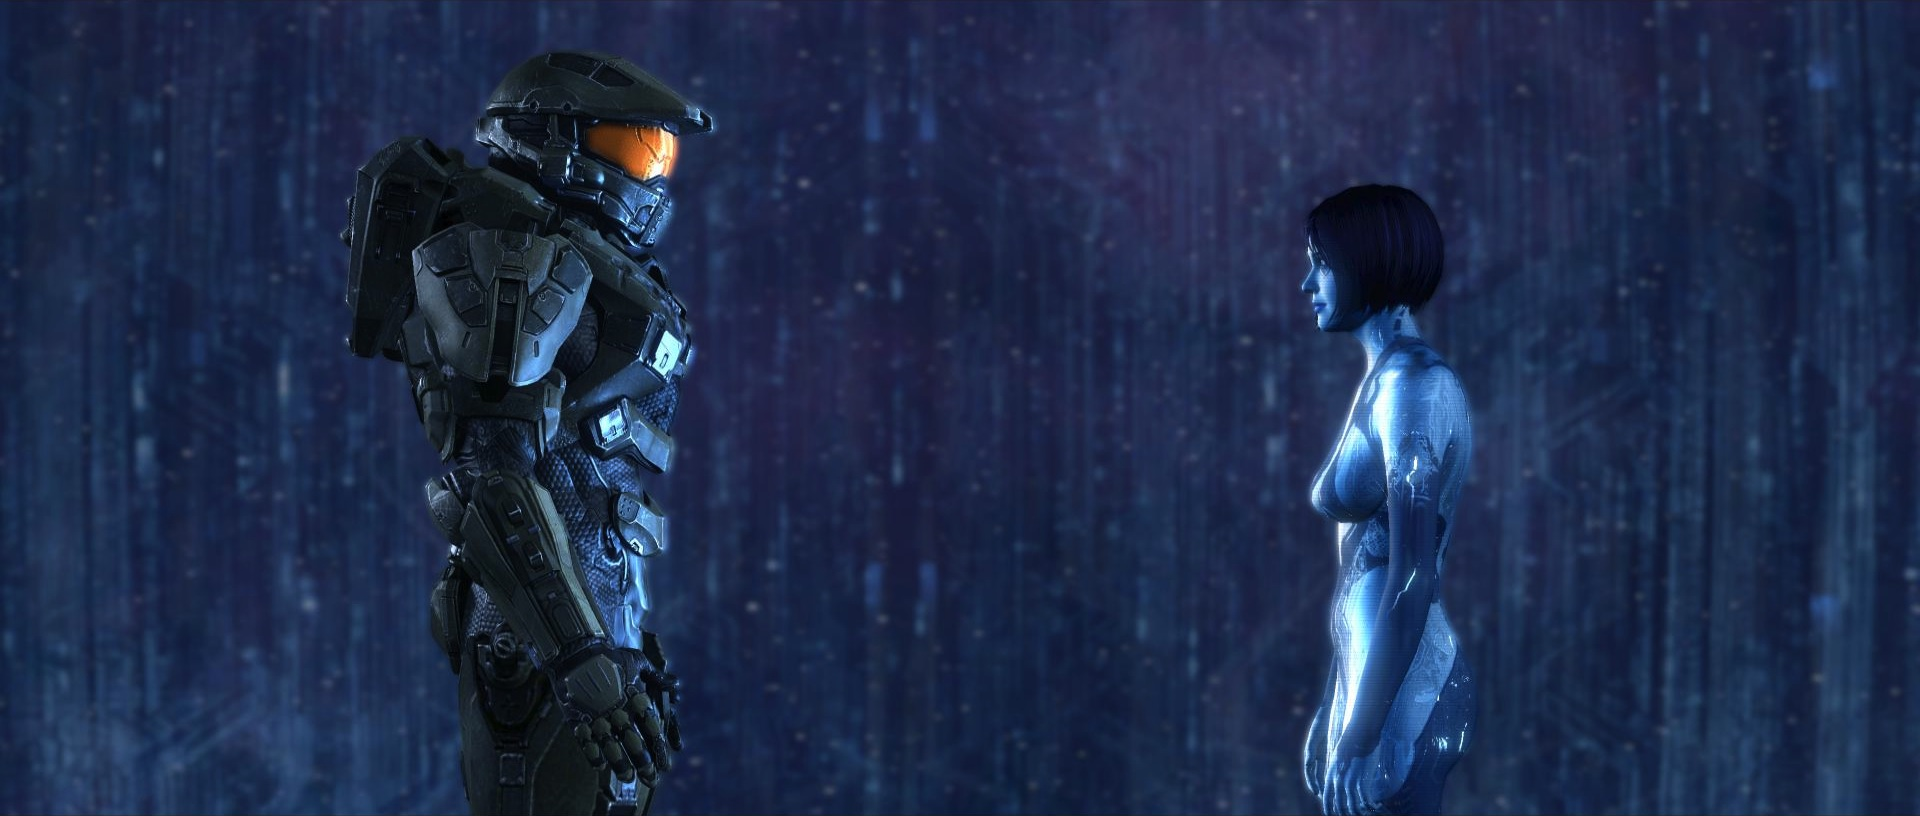 John_and_Cortana_re-unite_-_Close_shot